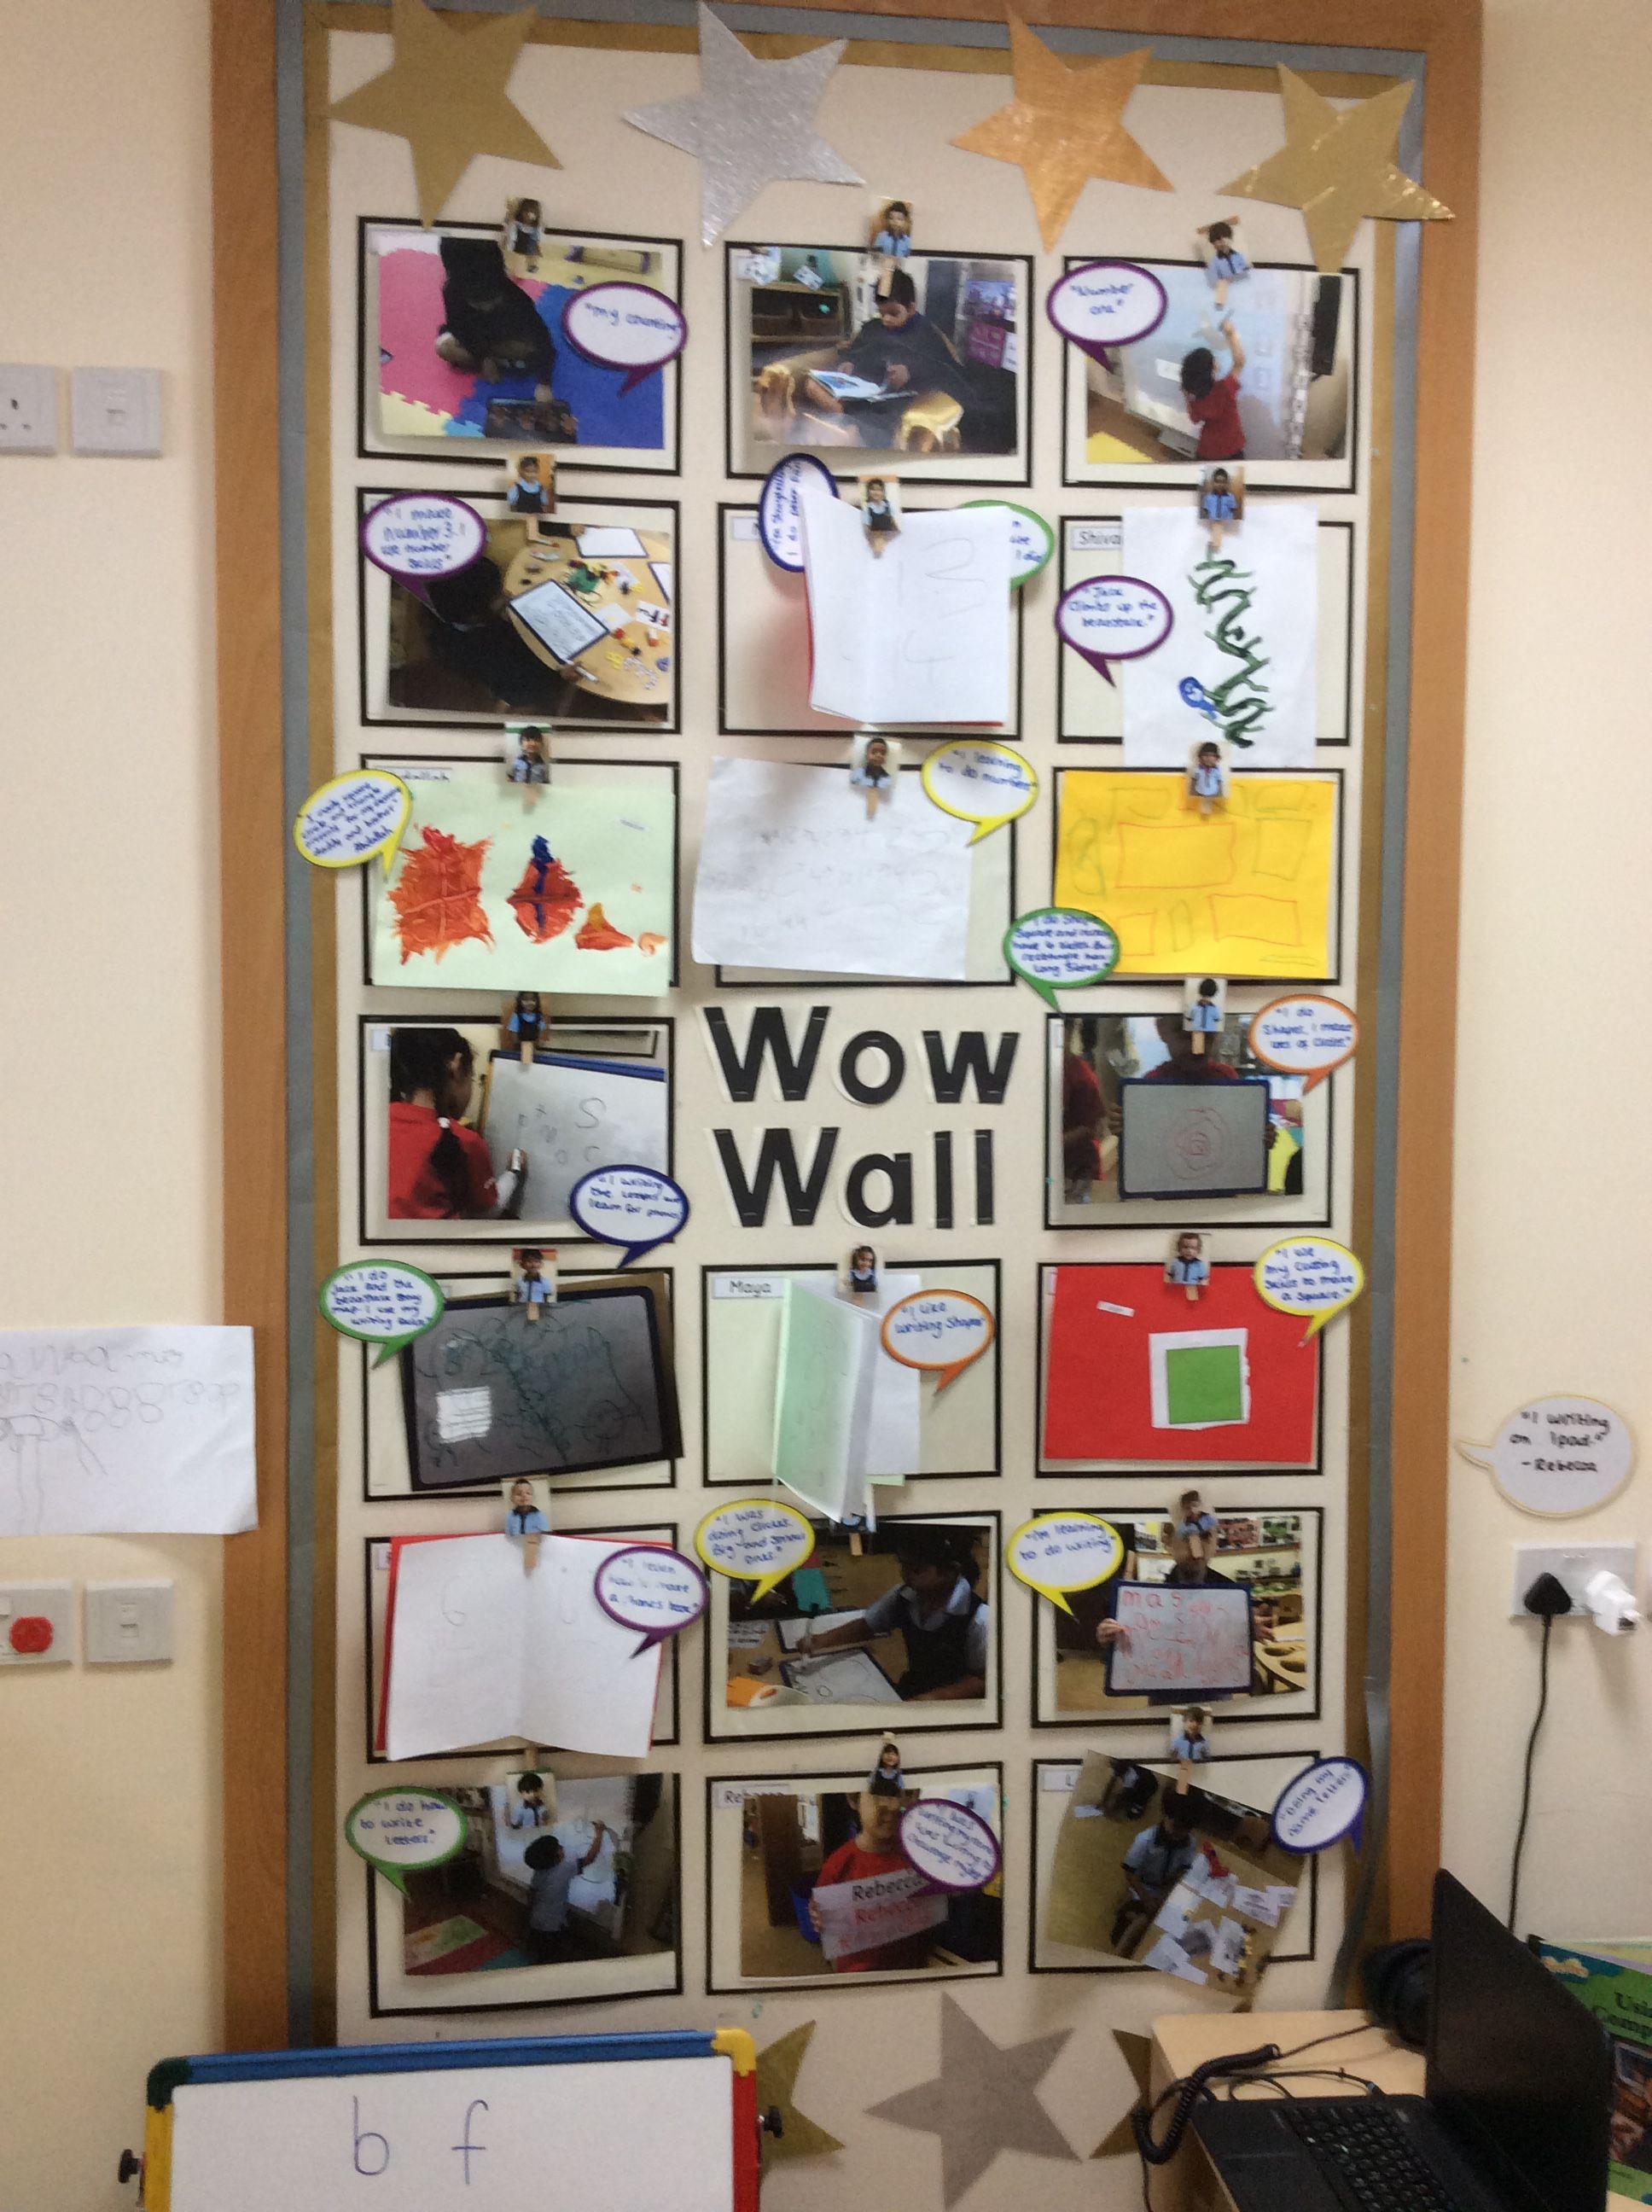 Wow Wall Children S Self Display Area Board Were Children